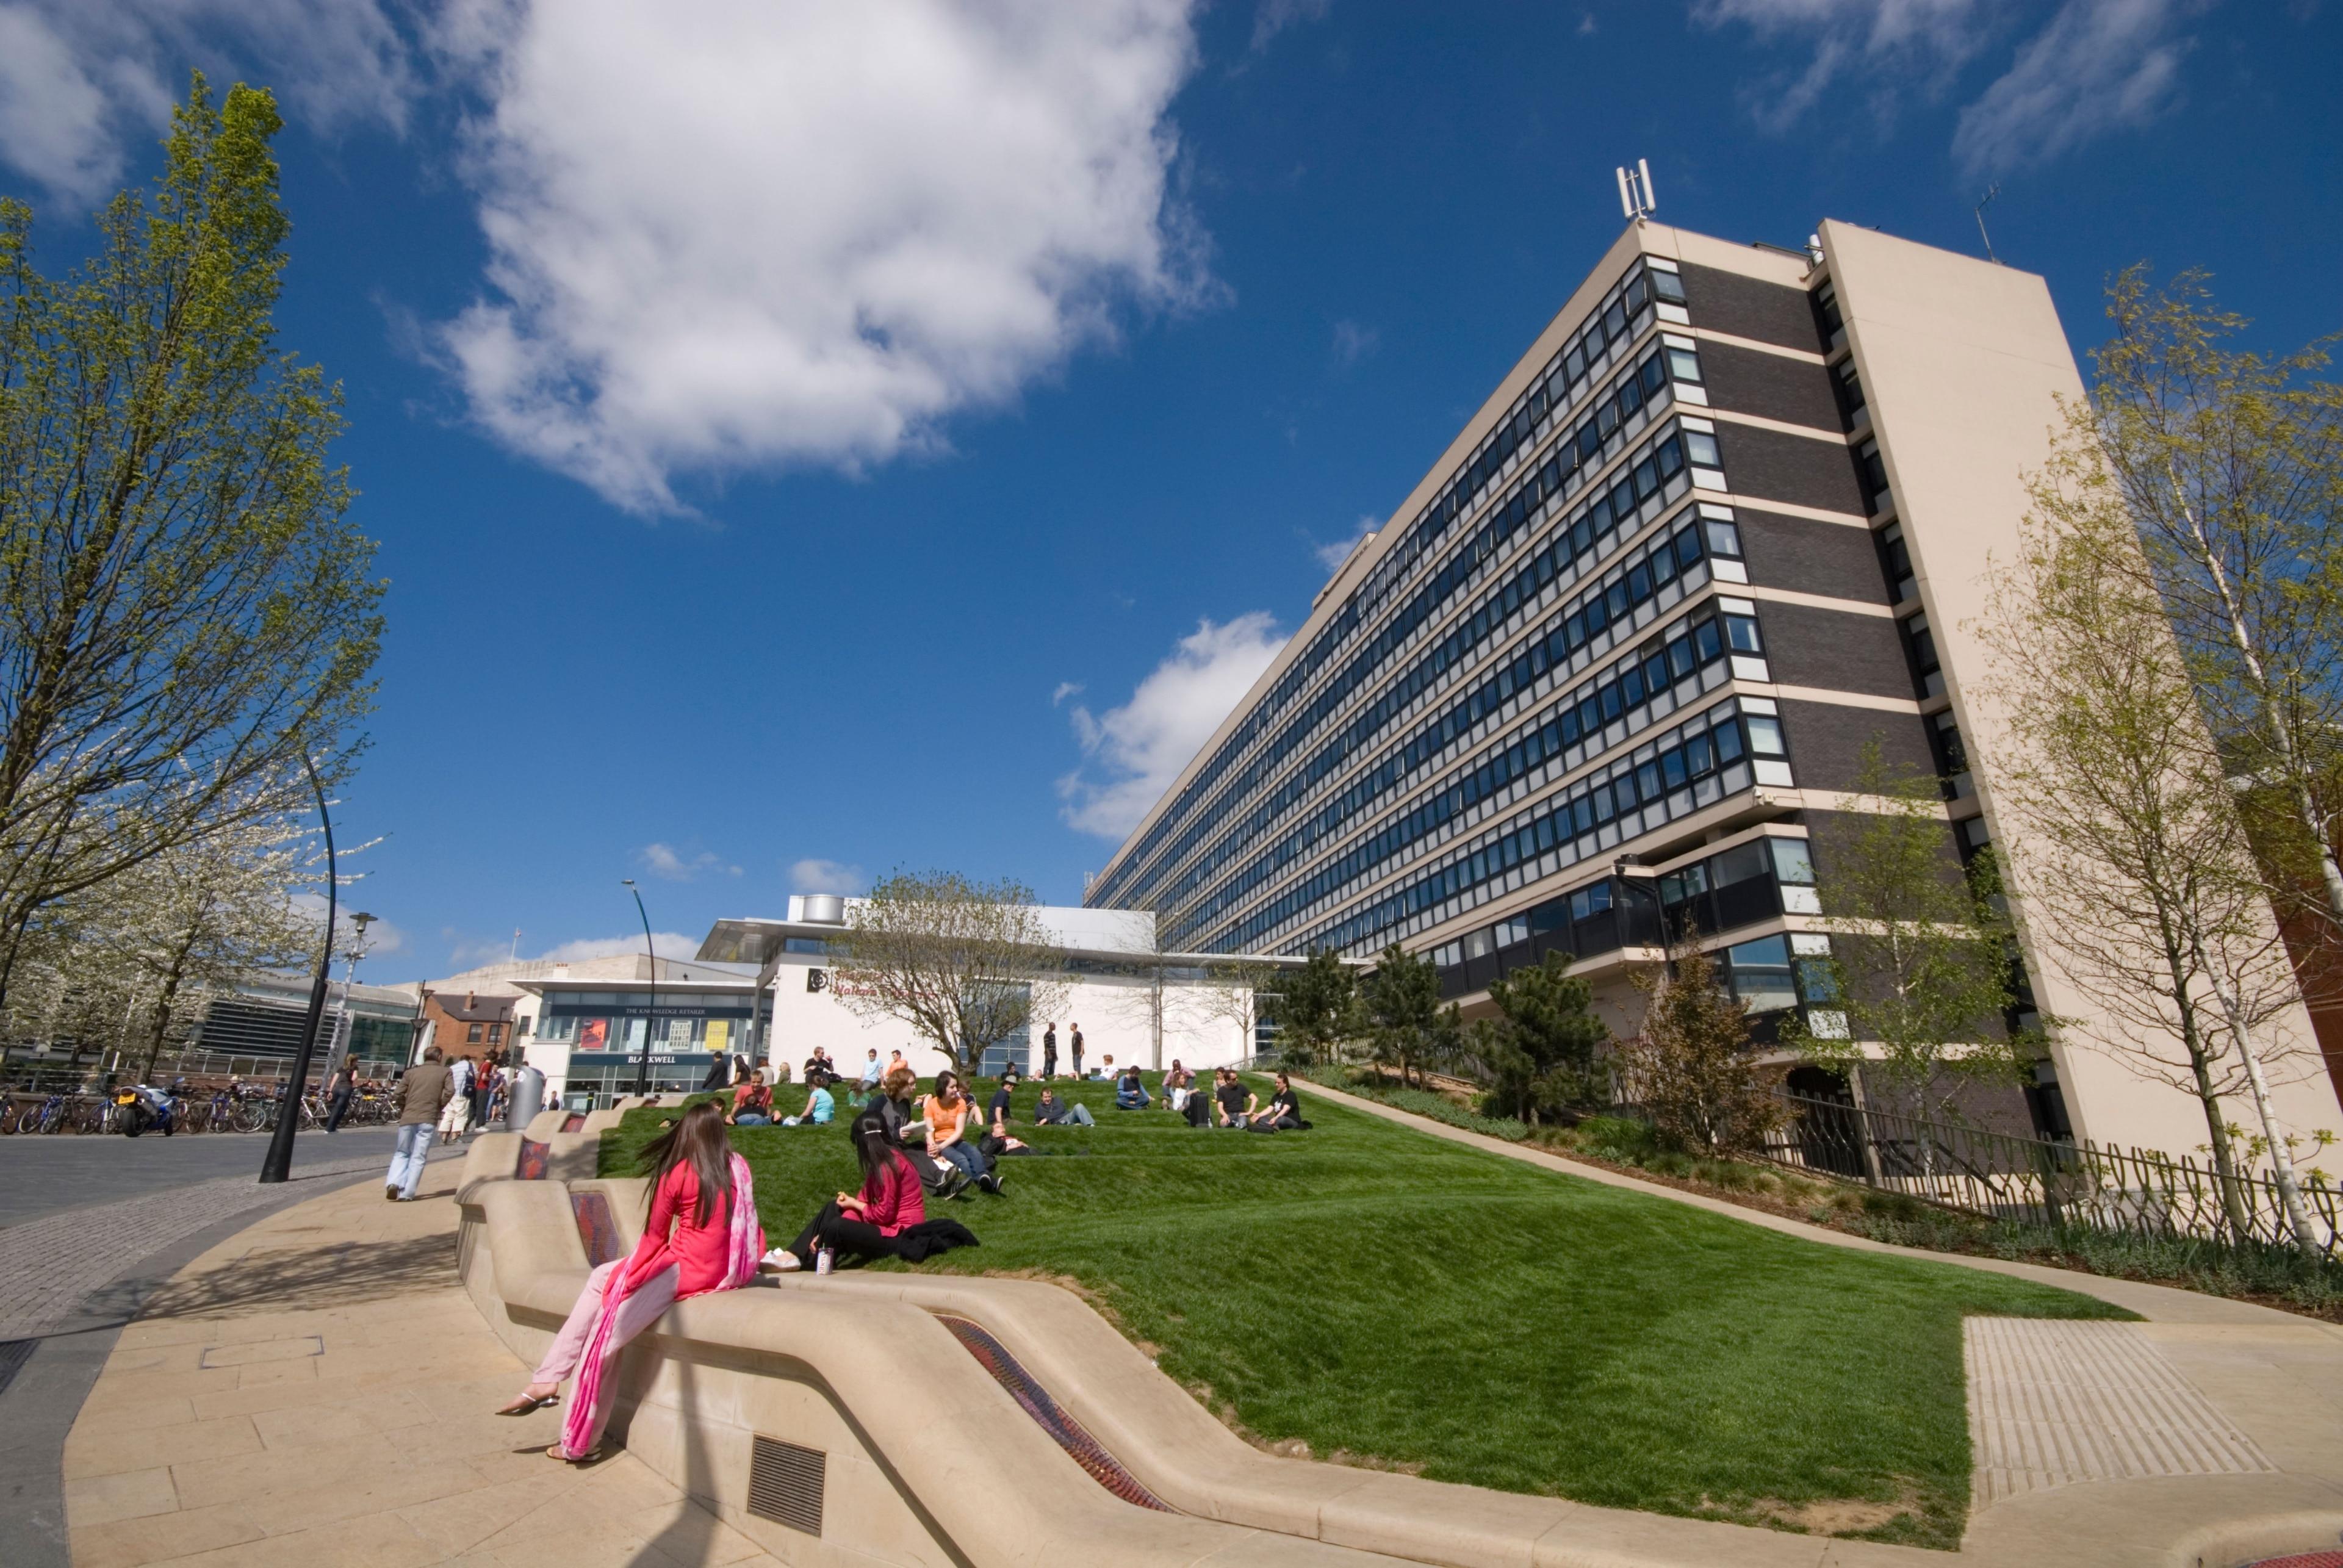 Sheffield Hallam University, Sheffield, England, United Kingdom